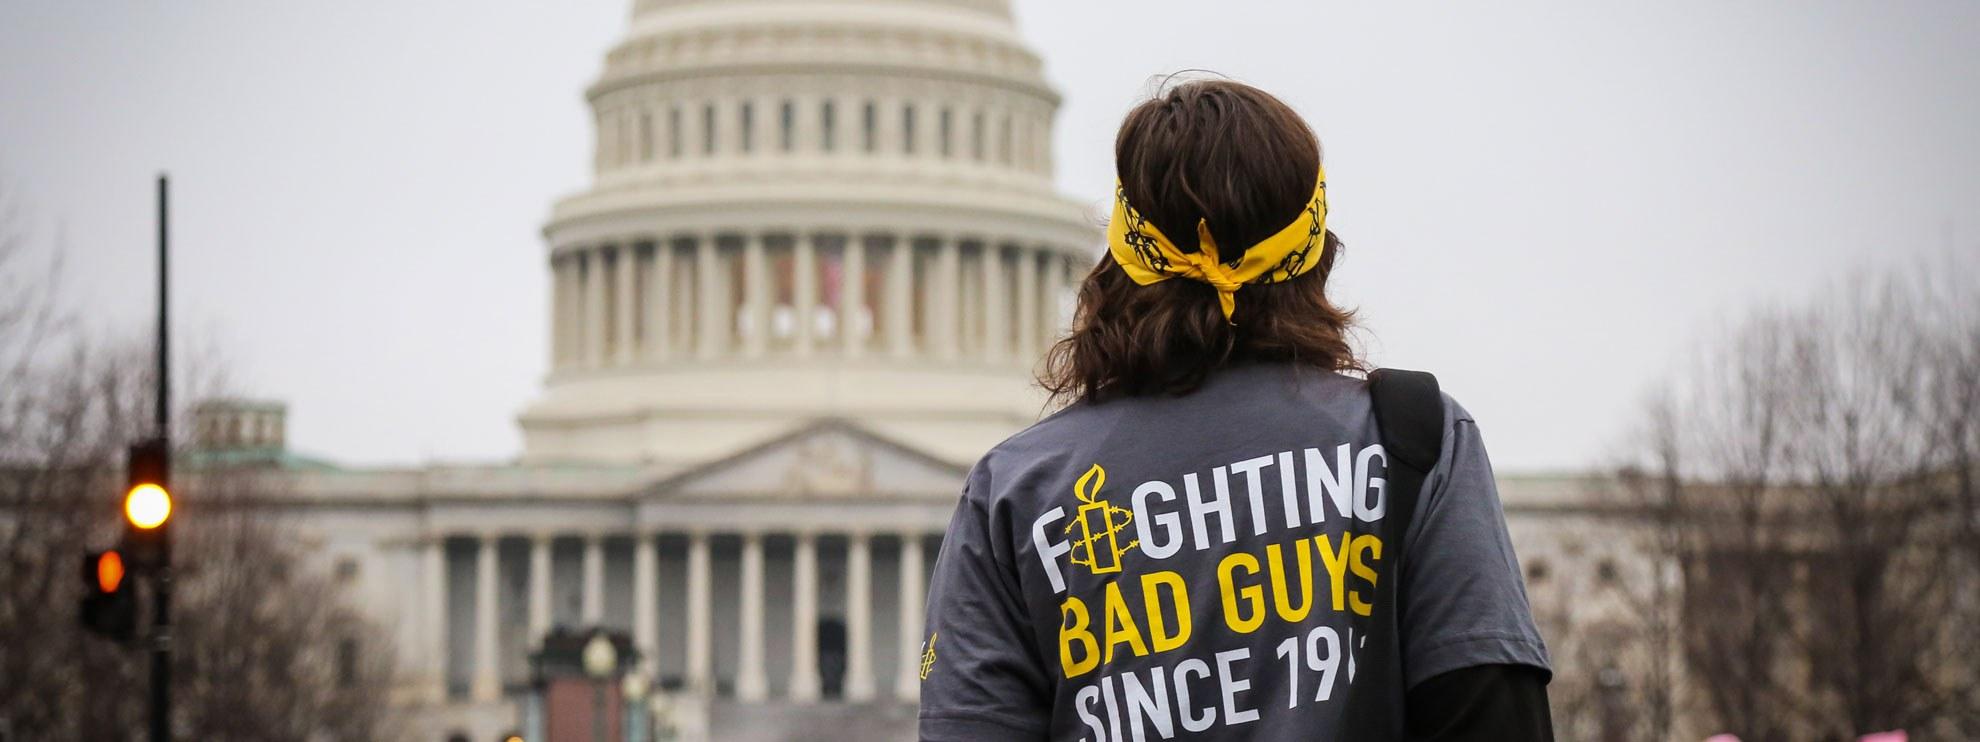 © Amnesty International USA